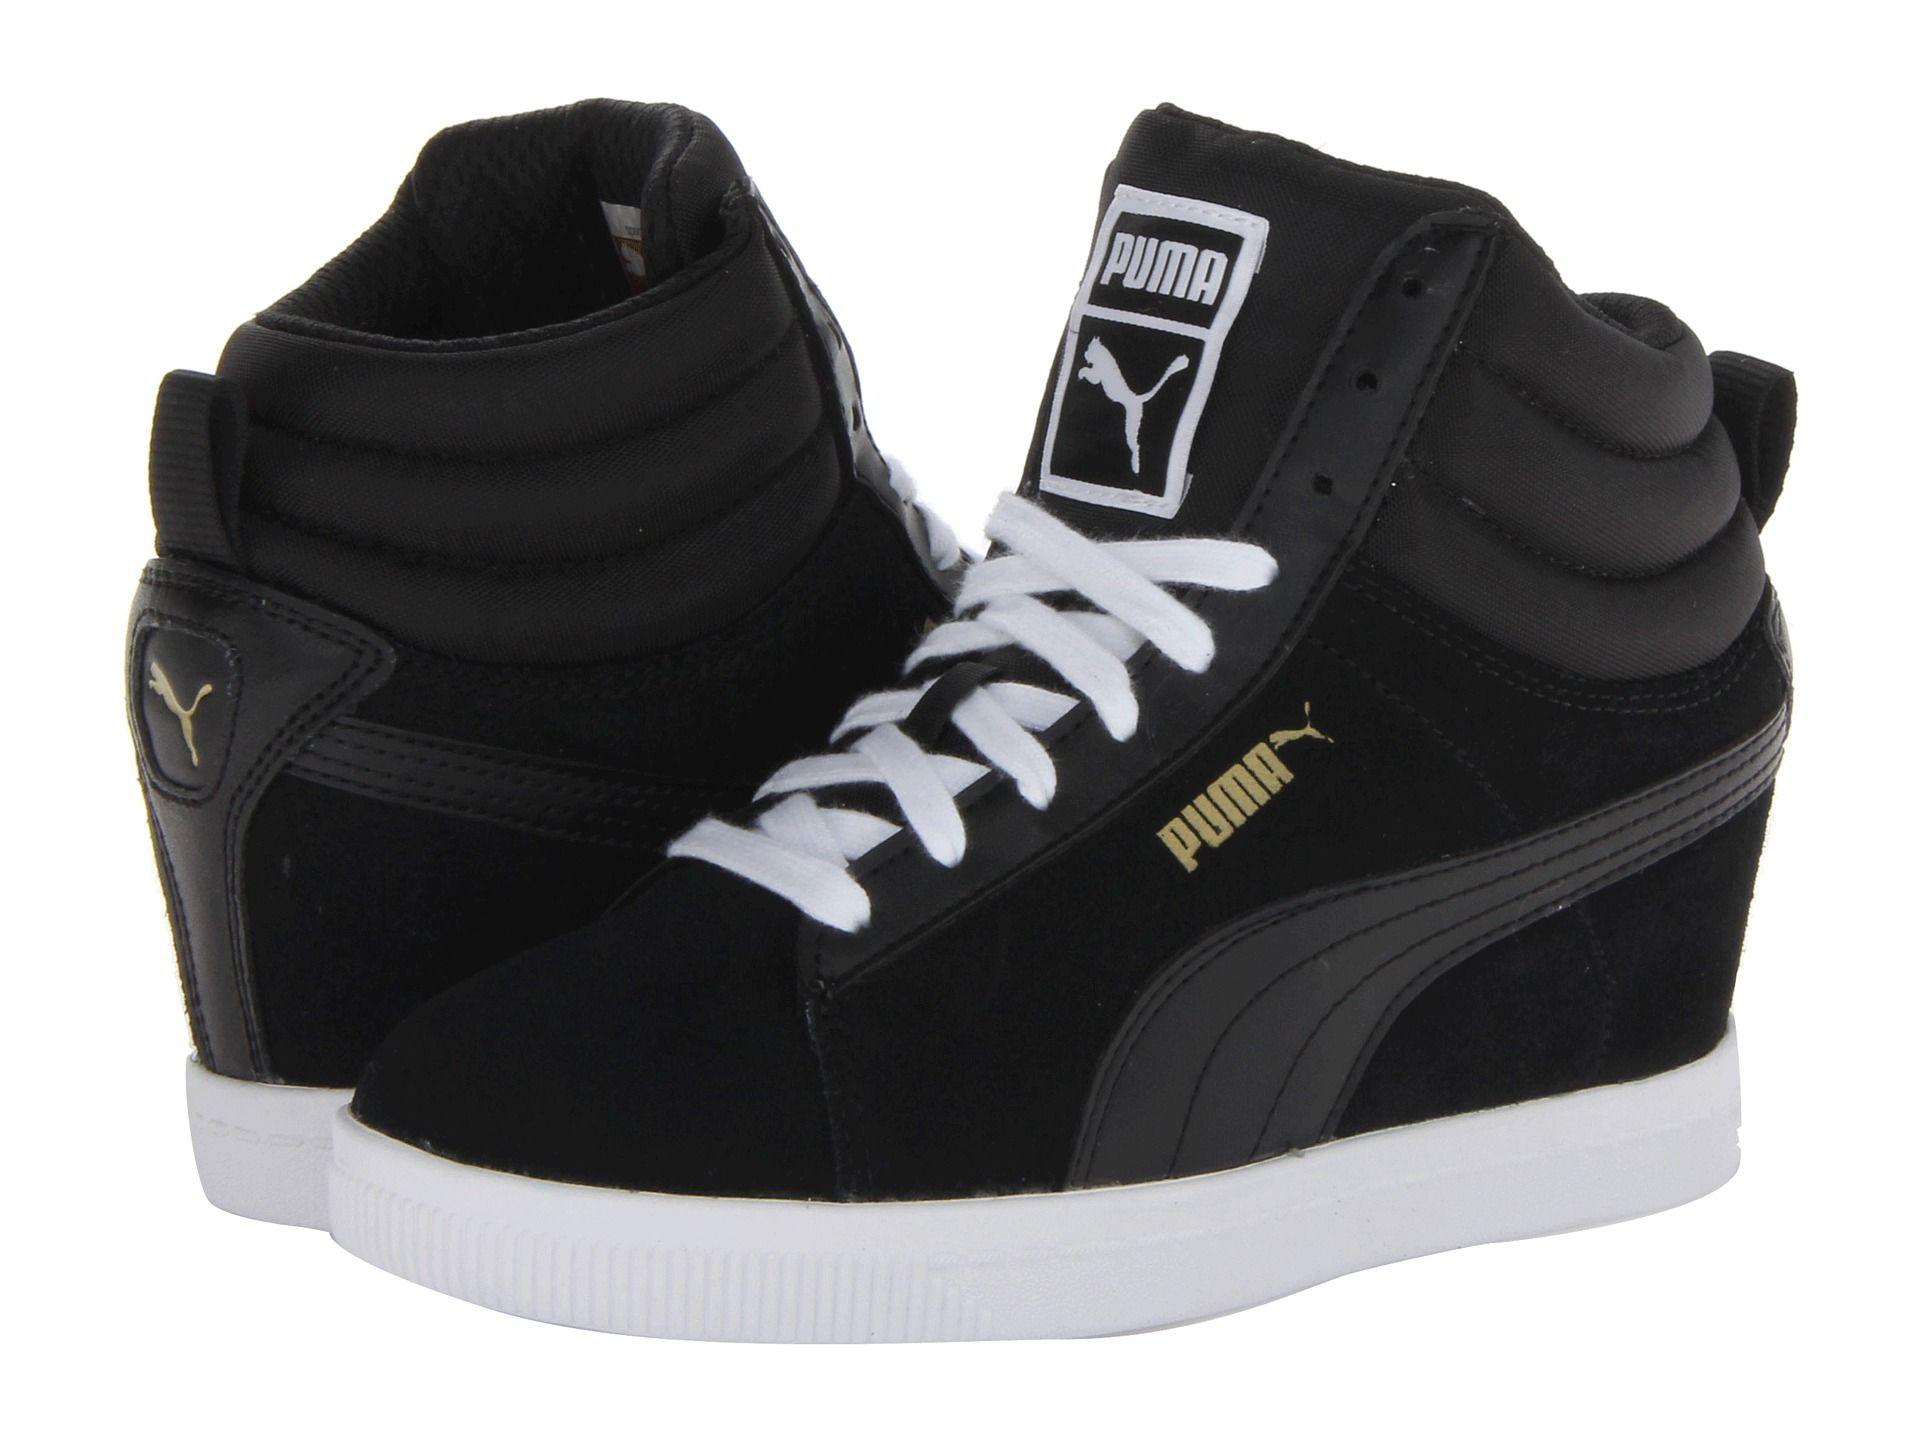 287f855987ca I m kinda over sneaker wedges too but I haven t had a pair yet! Lol. ~ PUMA  Puma Classic Wedge Black